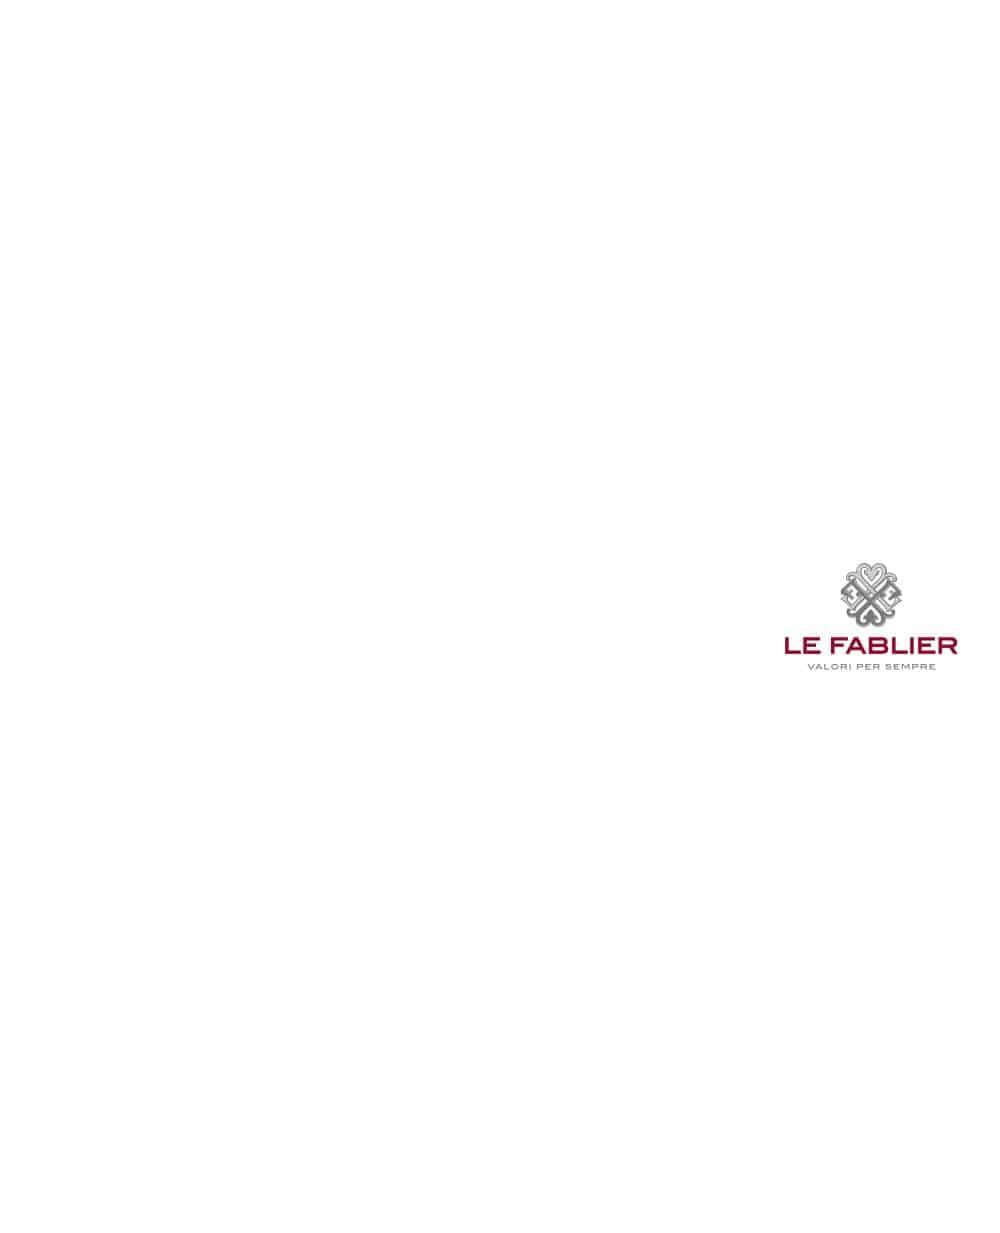 I LAURI - LE FABLIER - PDF Katalog | Beschreibung | Prospekt